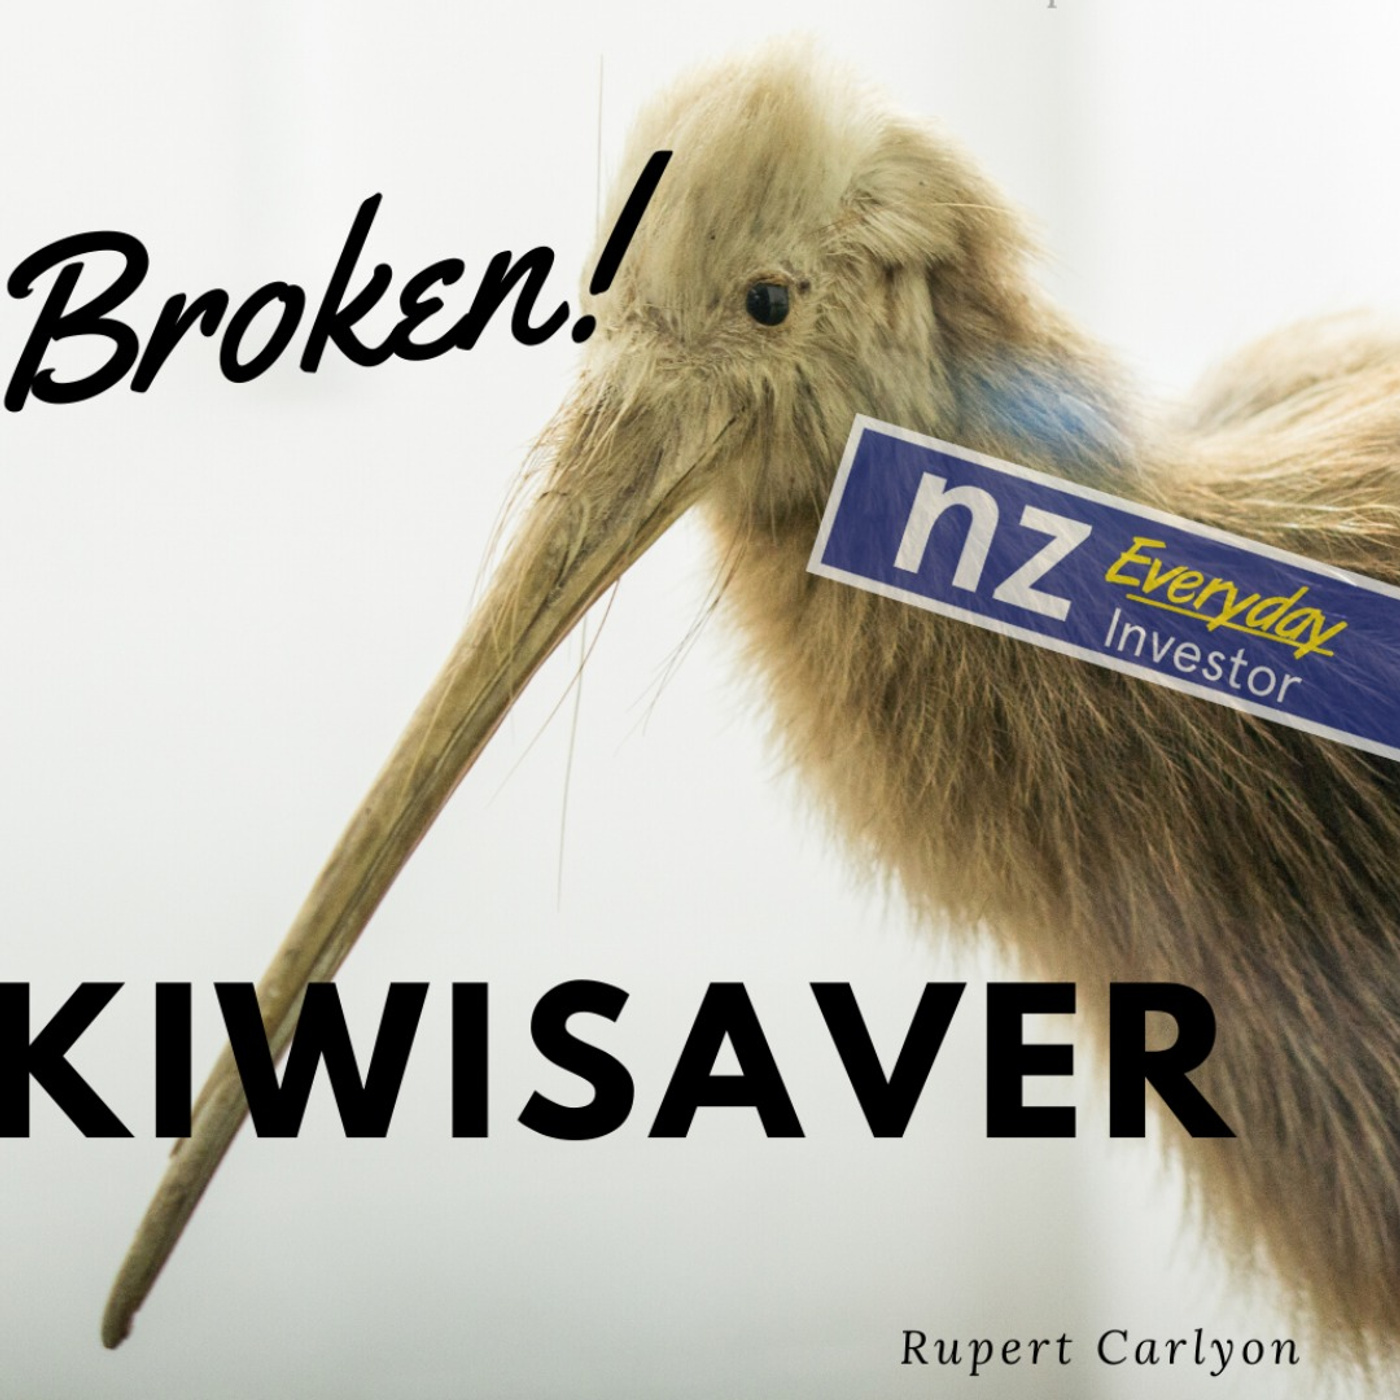 Broken KiwiSaver / Rupert Carlyon